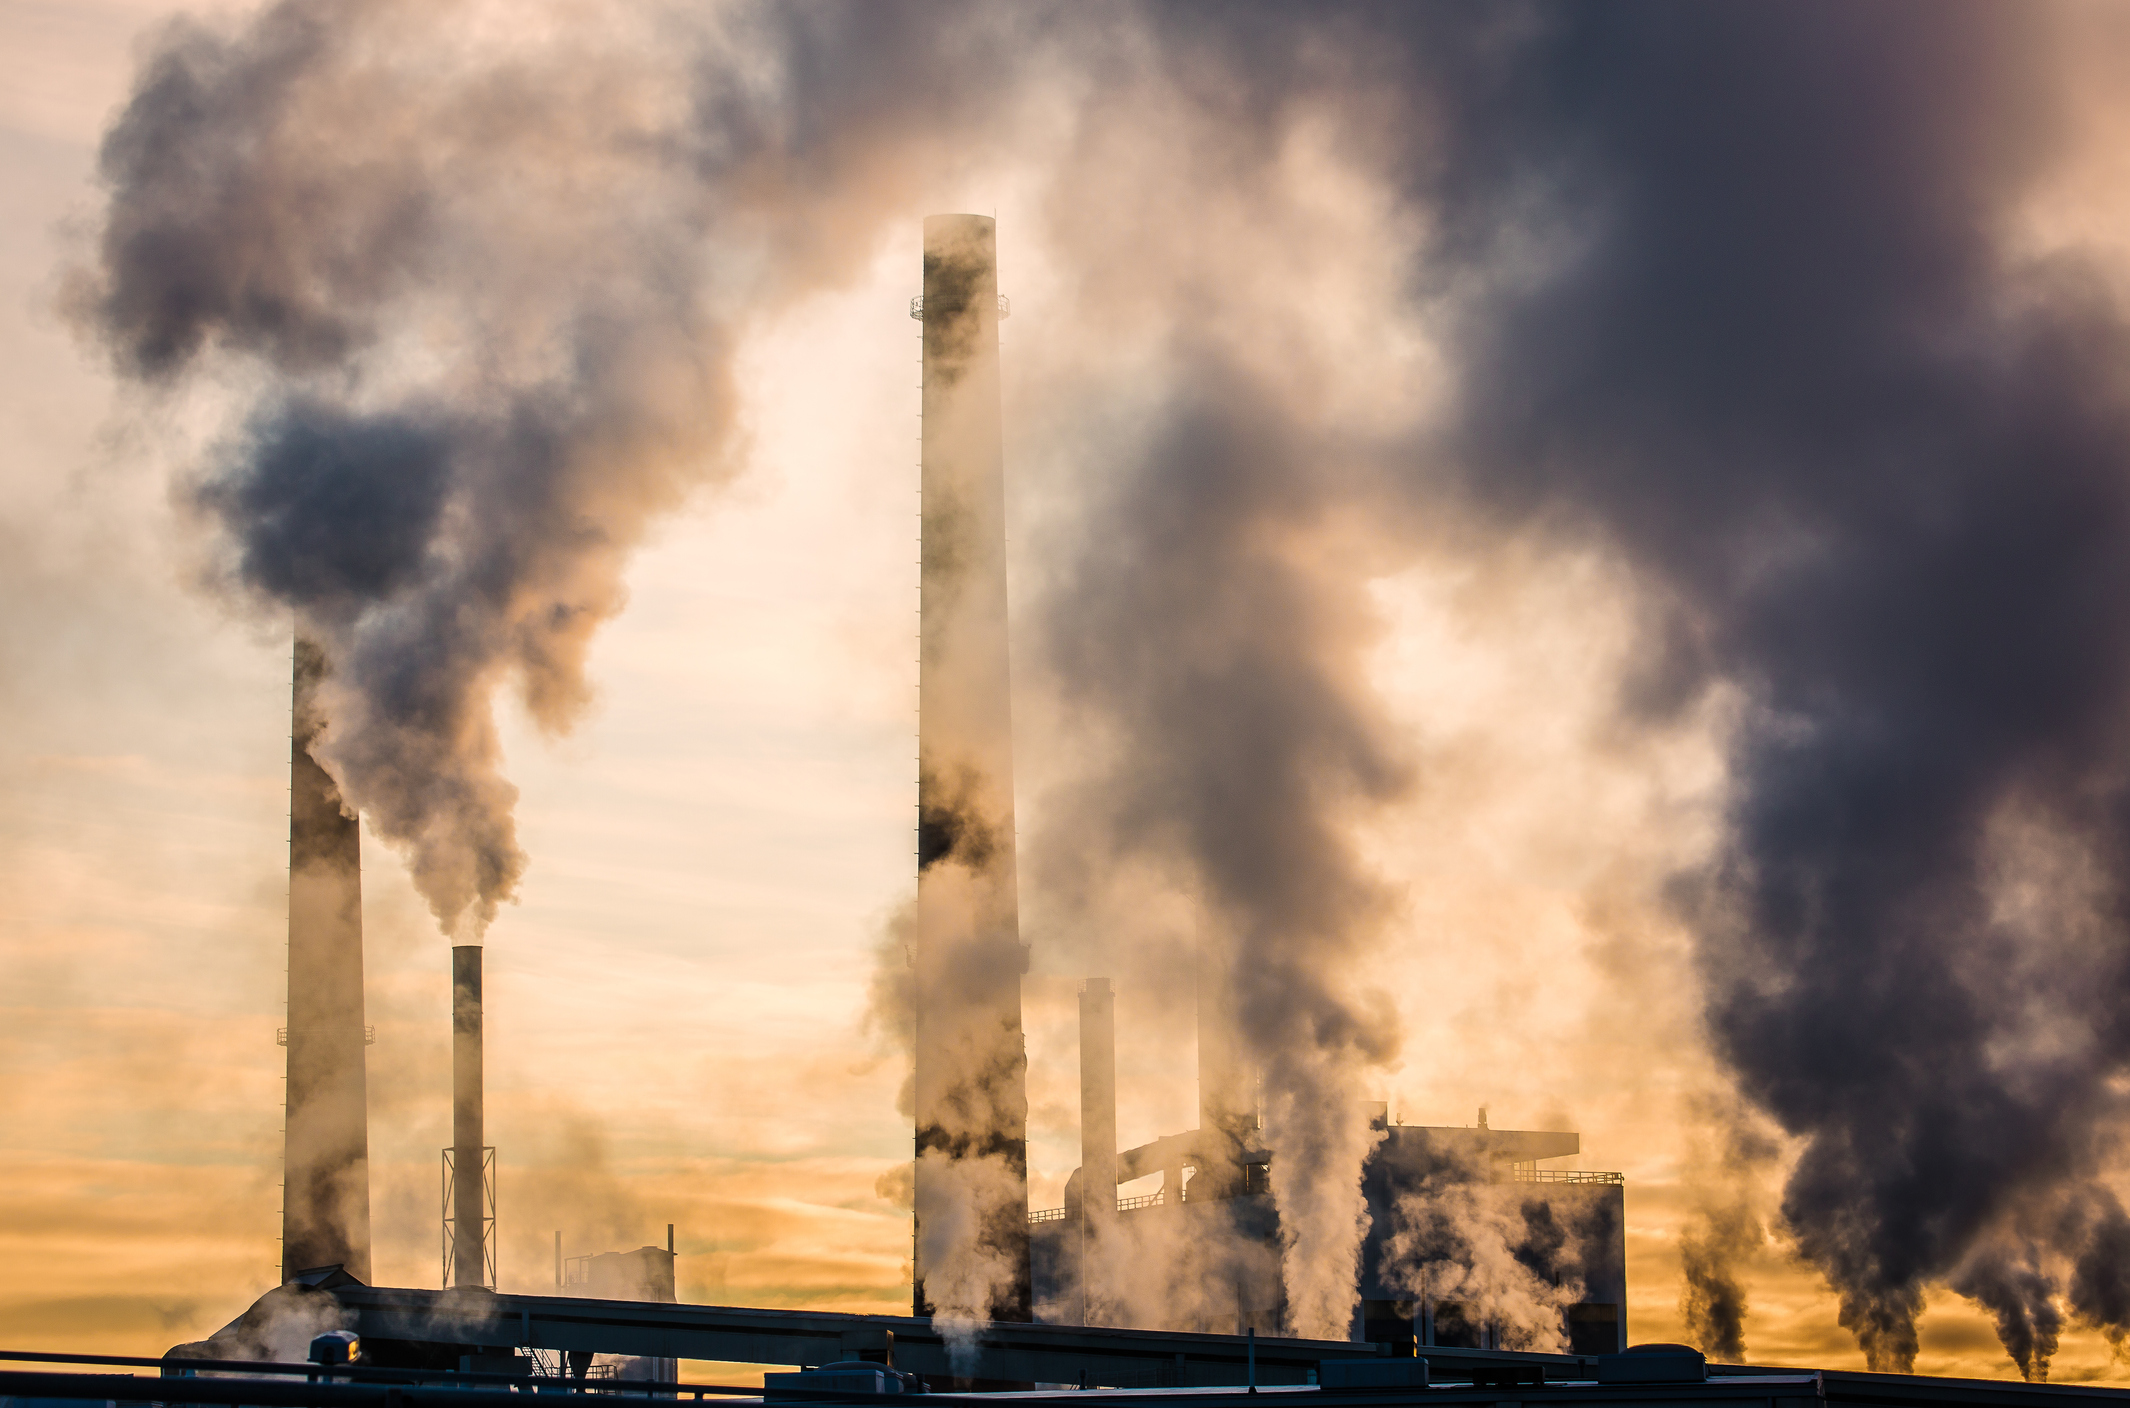 Carbon Dioxide Toxicity Symptoms